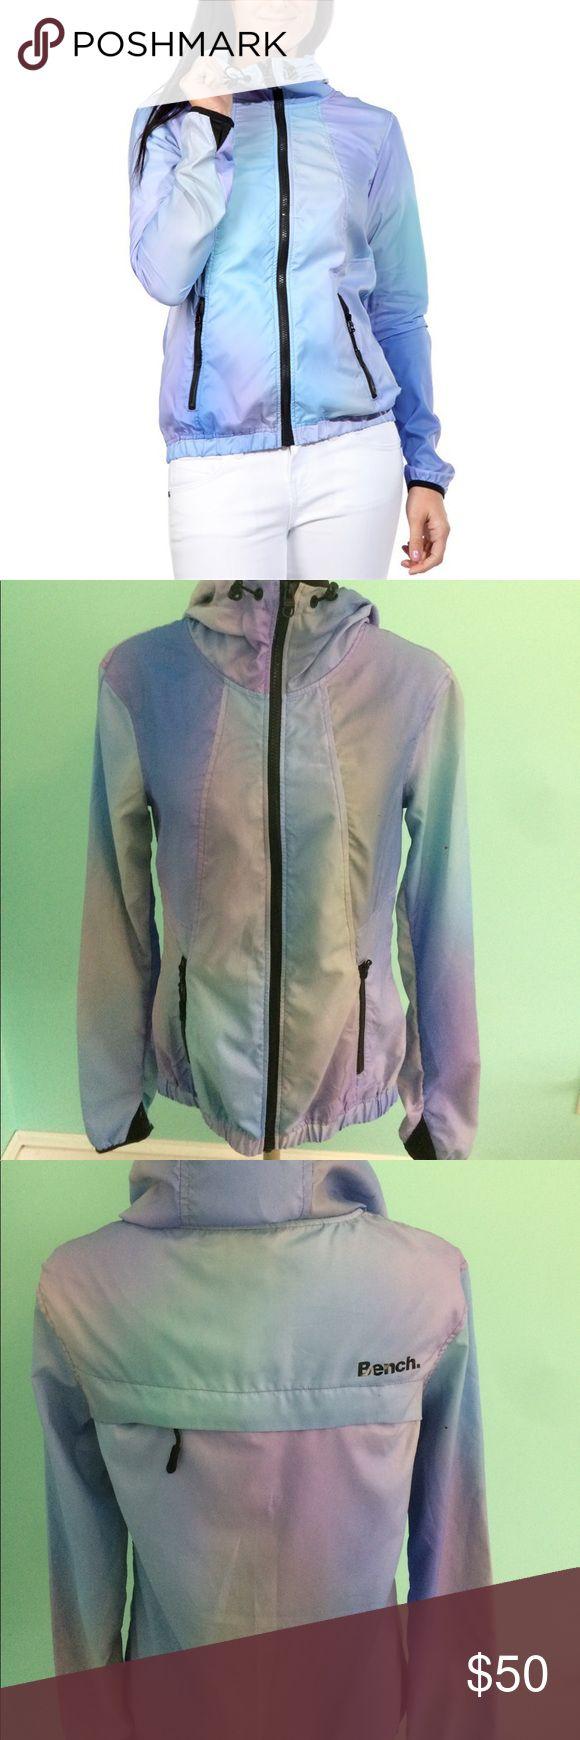 NWT- BENCH FANCIFUL B WINDBREAKER Packable light rain jacket, adorable tie dye colors Bench Jackets & Coats